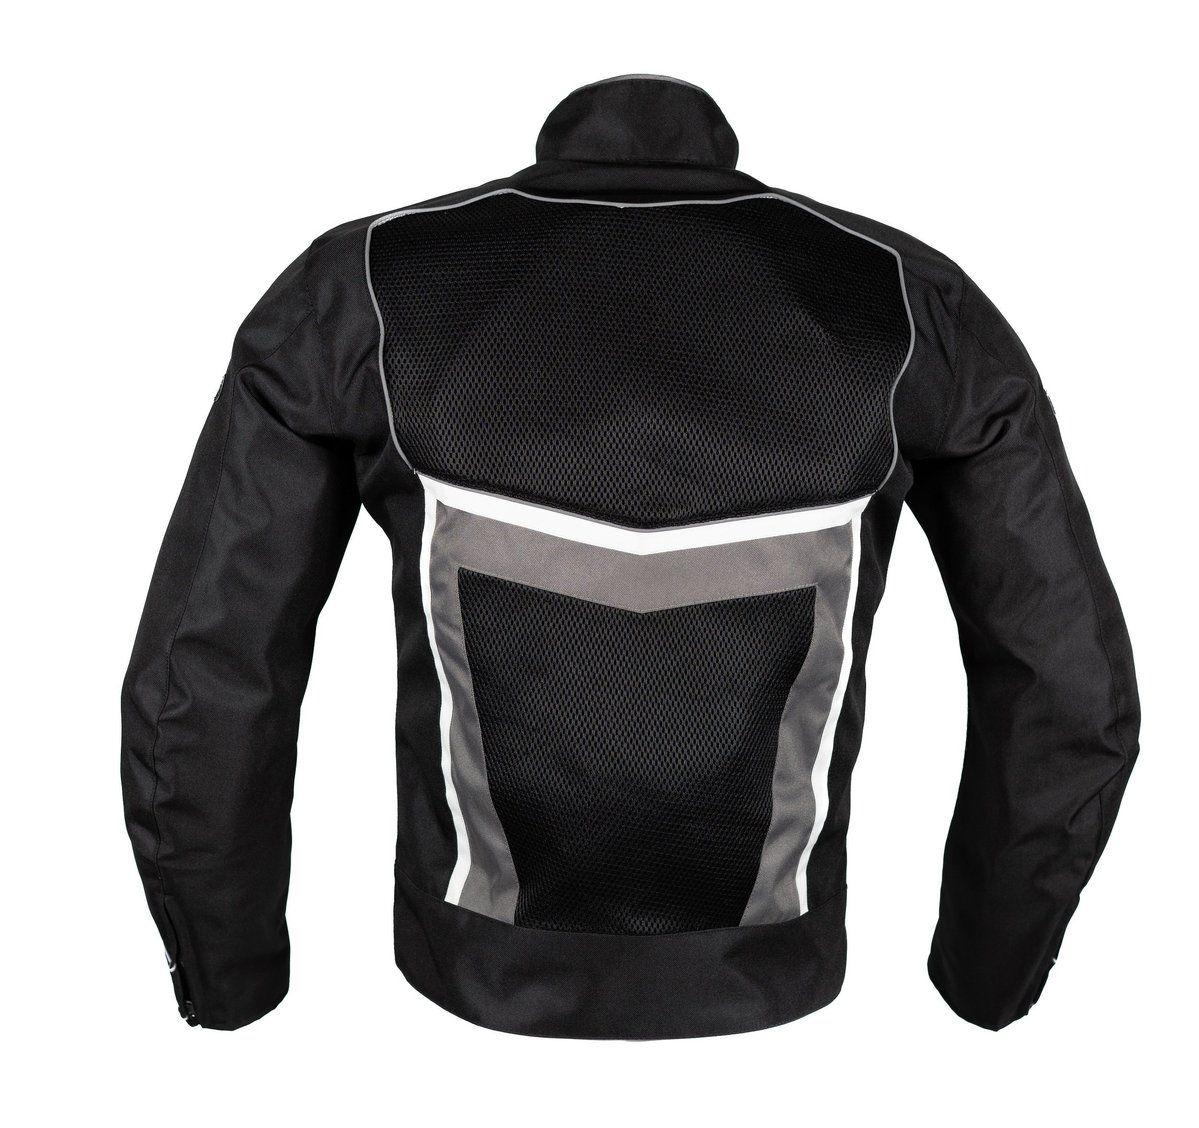 Motoart Reflectormx Textile Motorcycle Jacket Cordura 1000d Graphite Clarks Publishing Store In 2020 Motorcycle Jacket Mens Jackets Waterproof Motorcycle Jacket